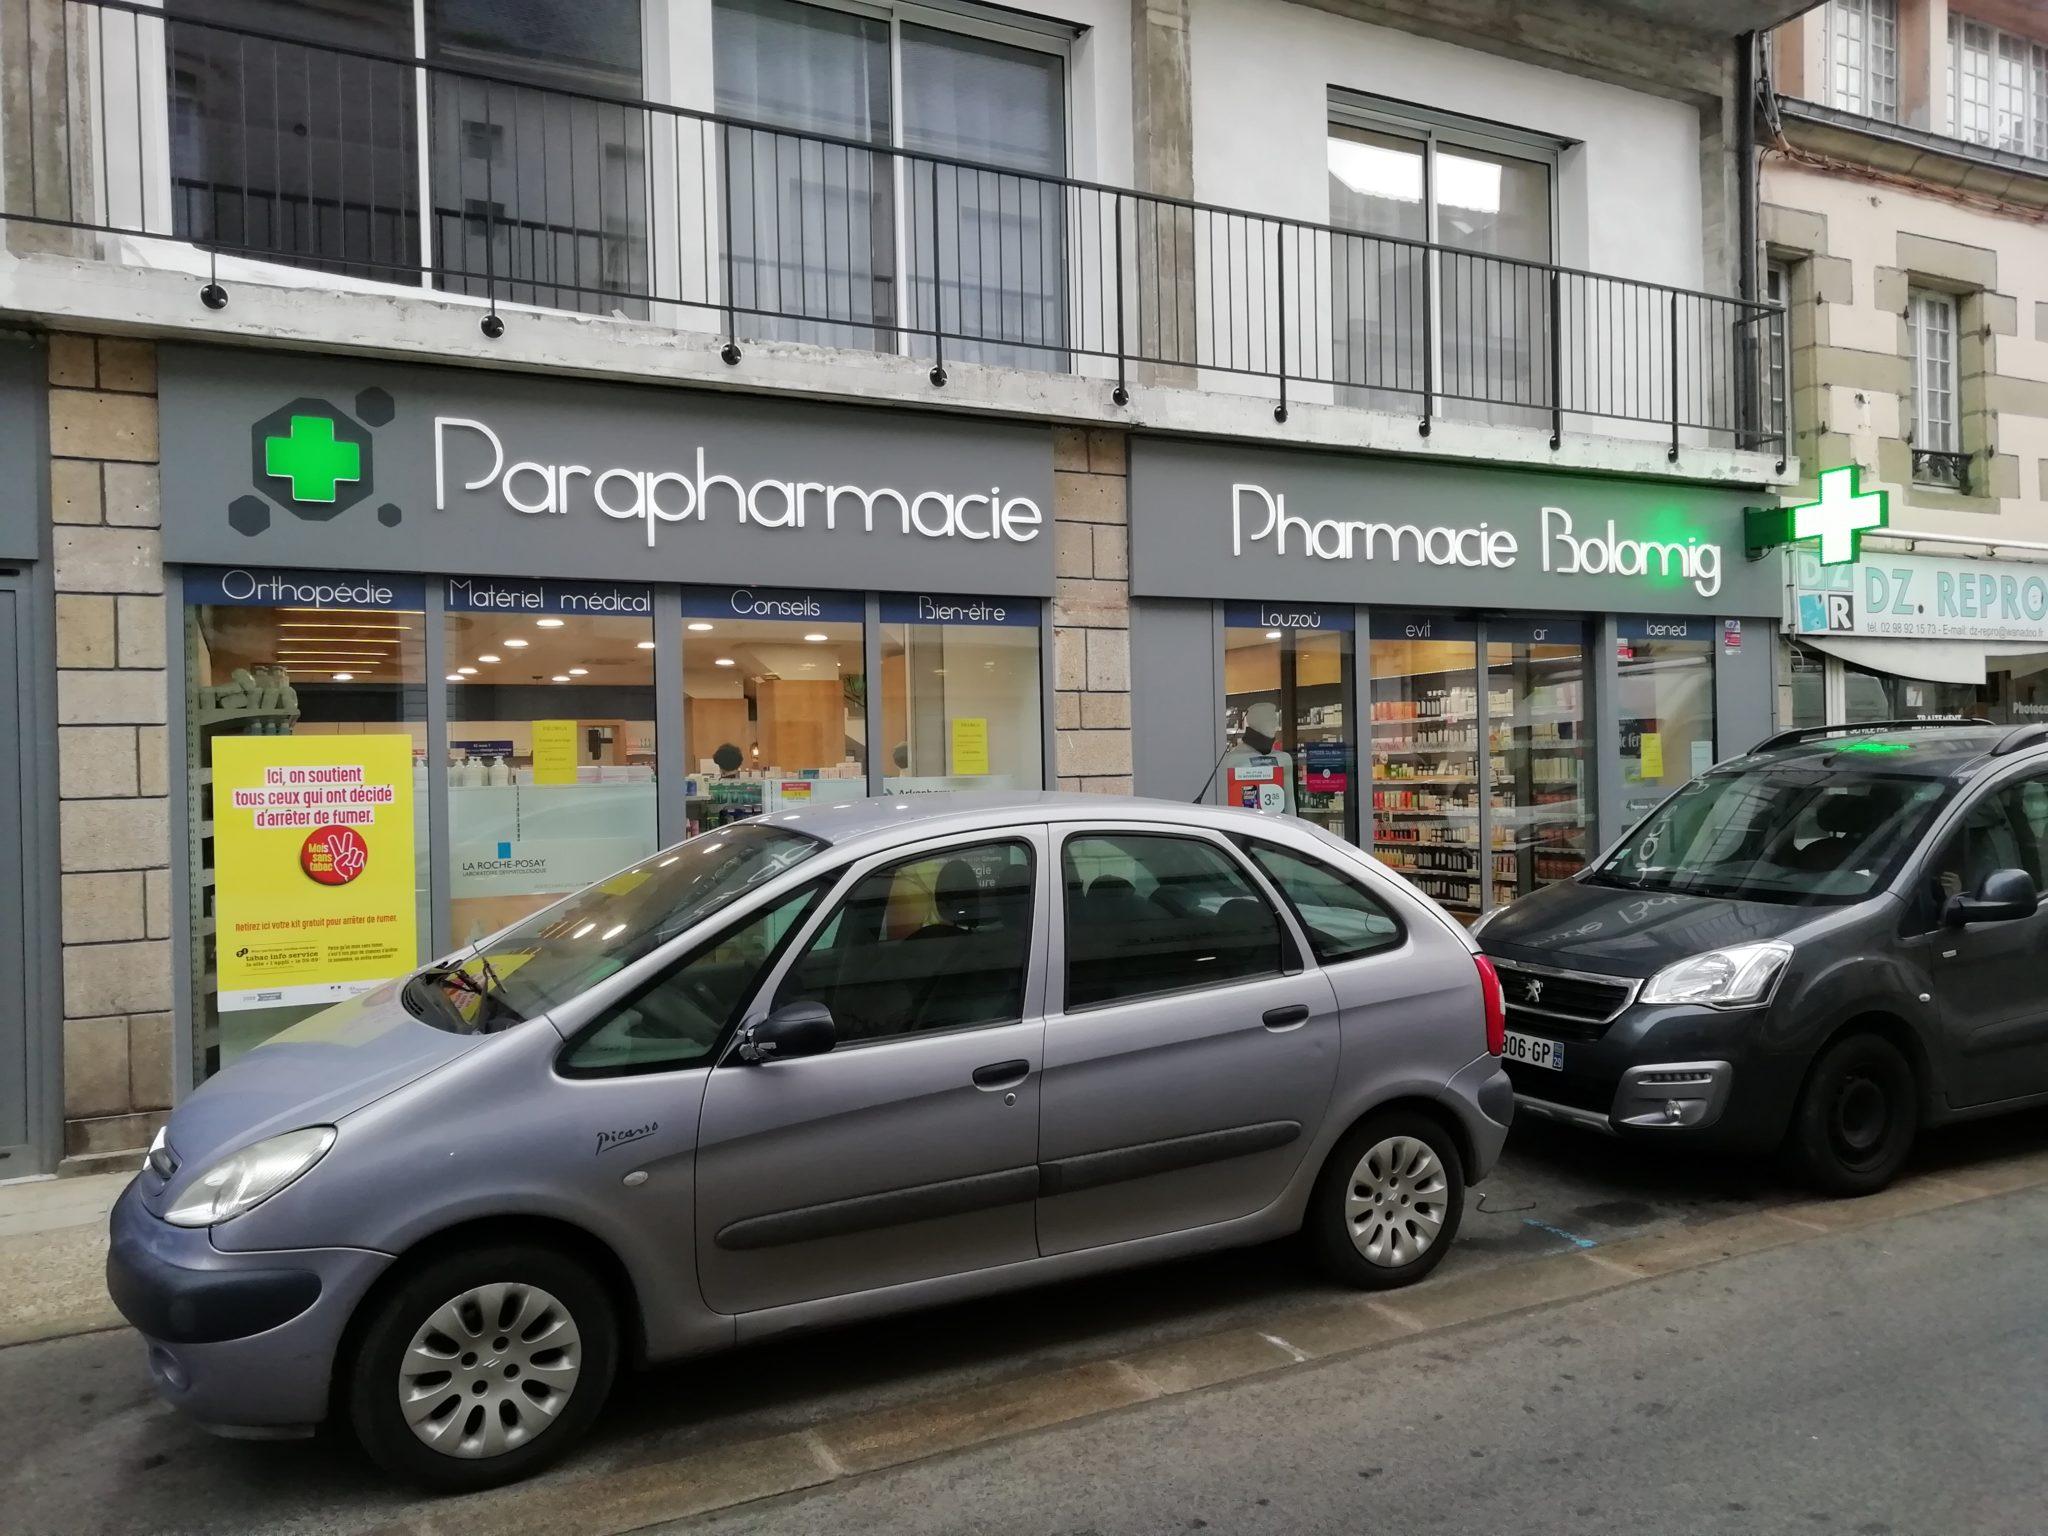 Pharmacie Bolomig - Douarnenez (2)